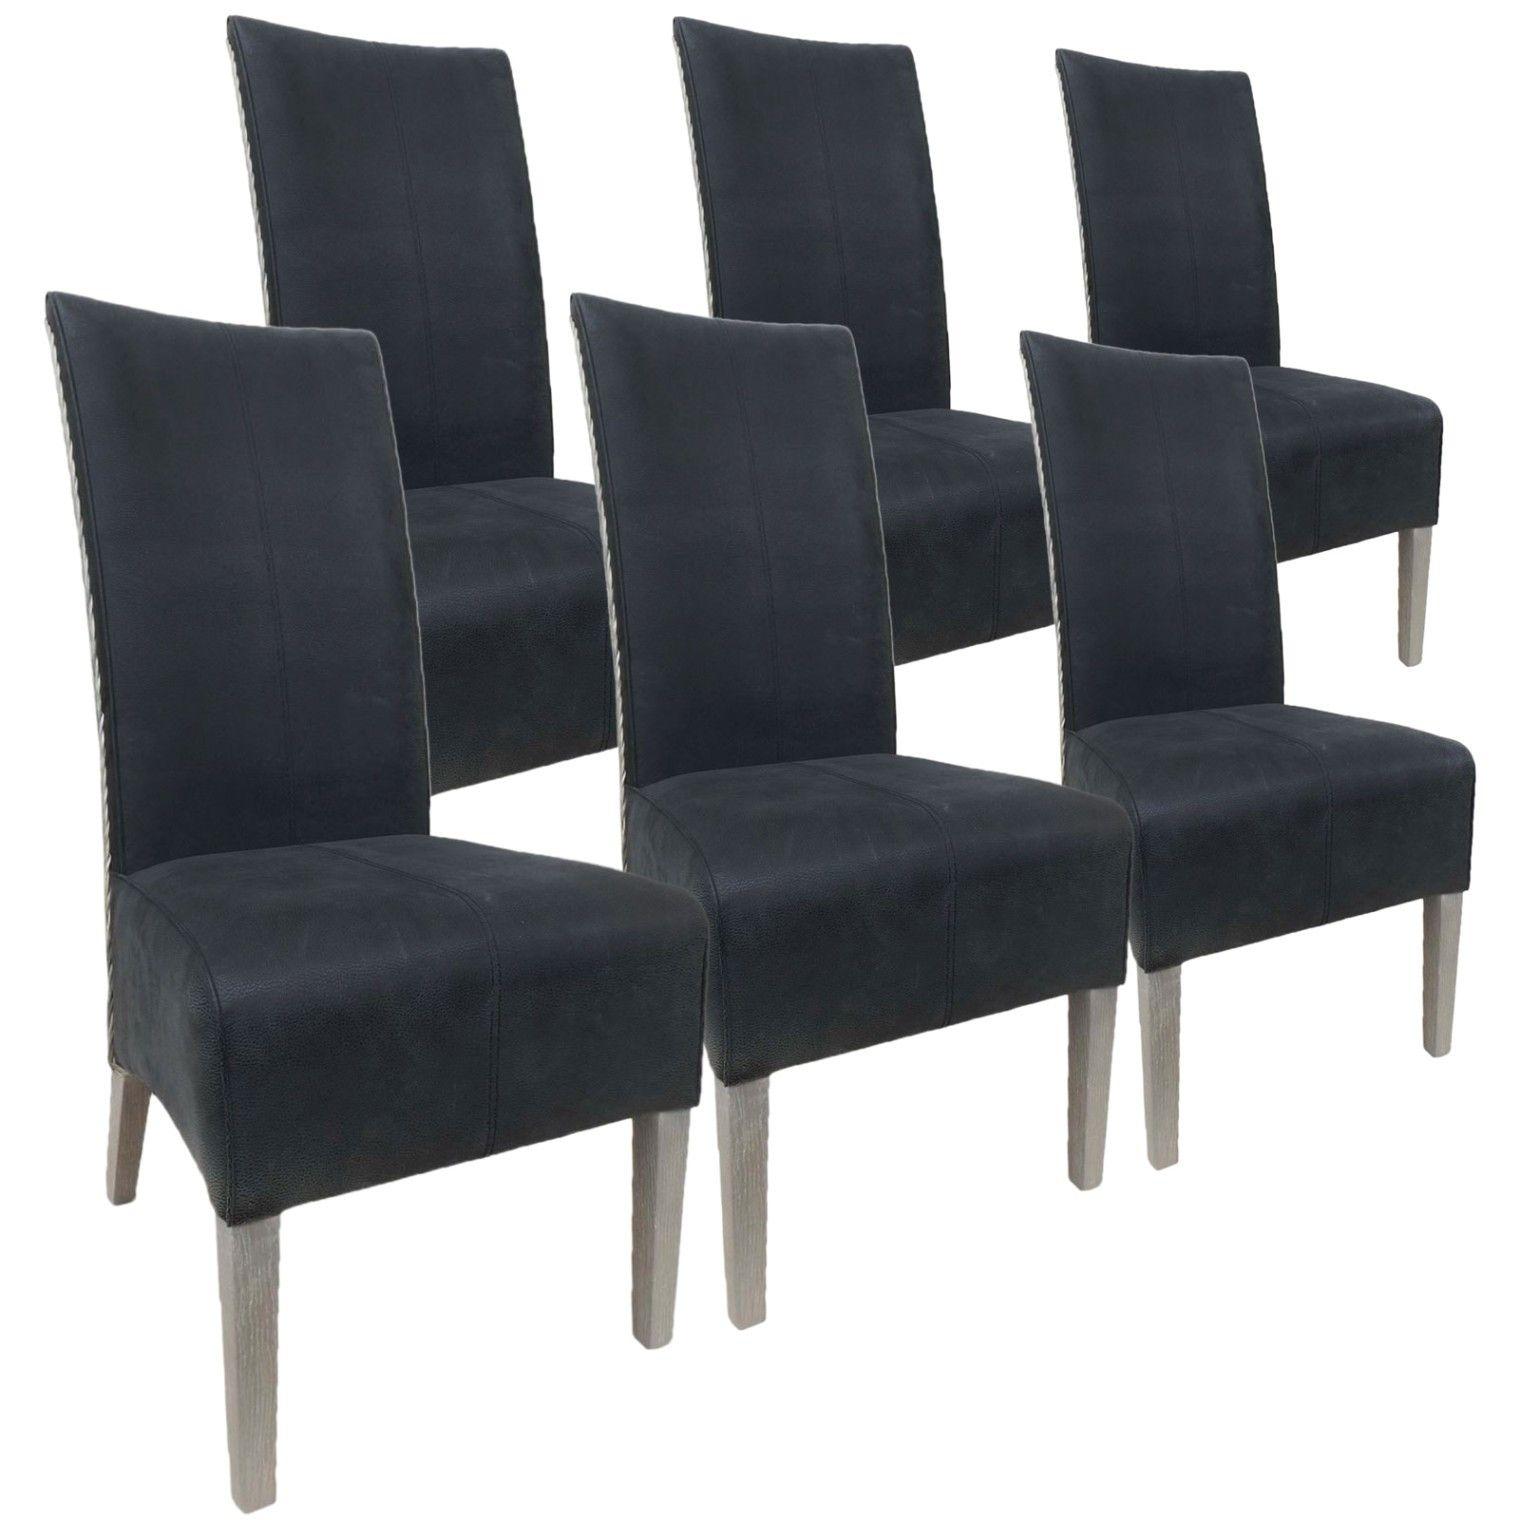 polyrattan stuehle aldi lounge balkonmobel outdoor wood chair lovely lounge balkonmobel 0d luxus